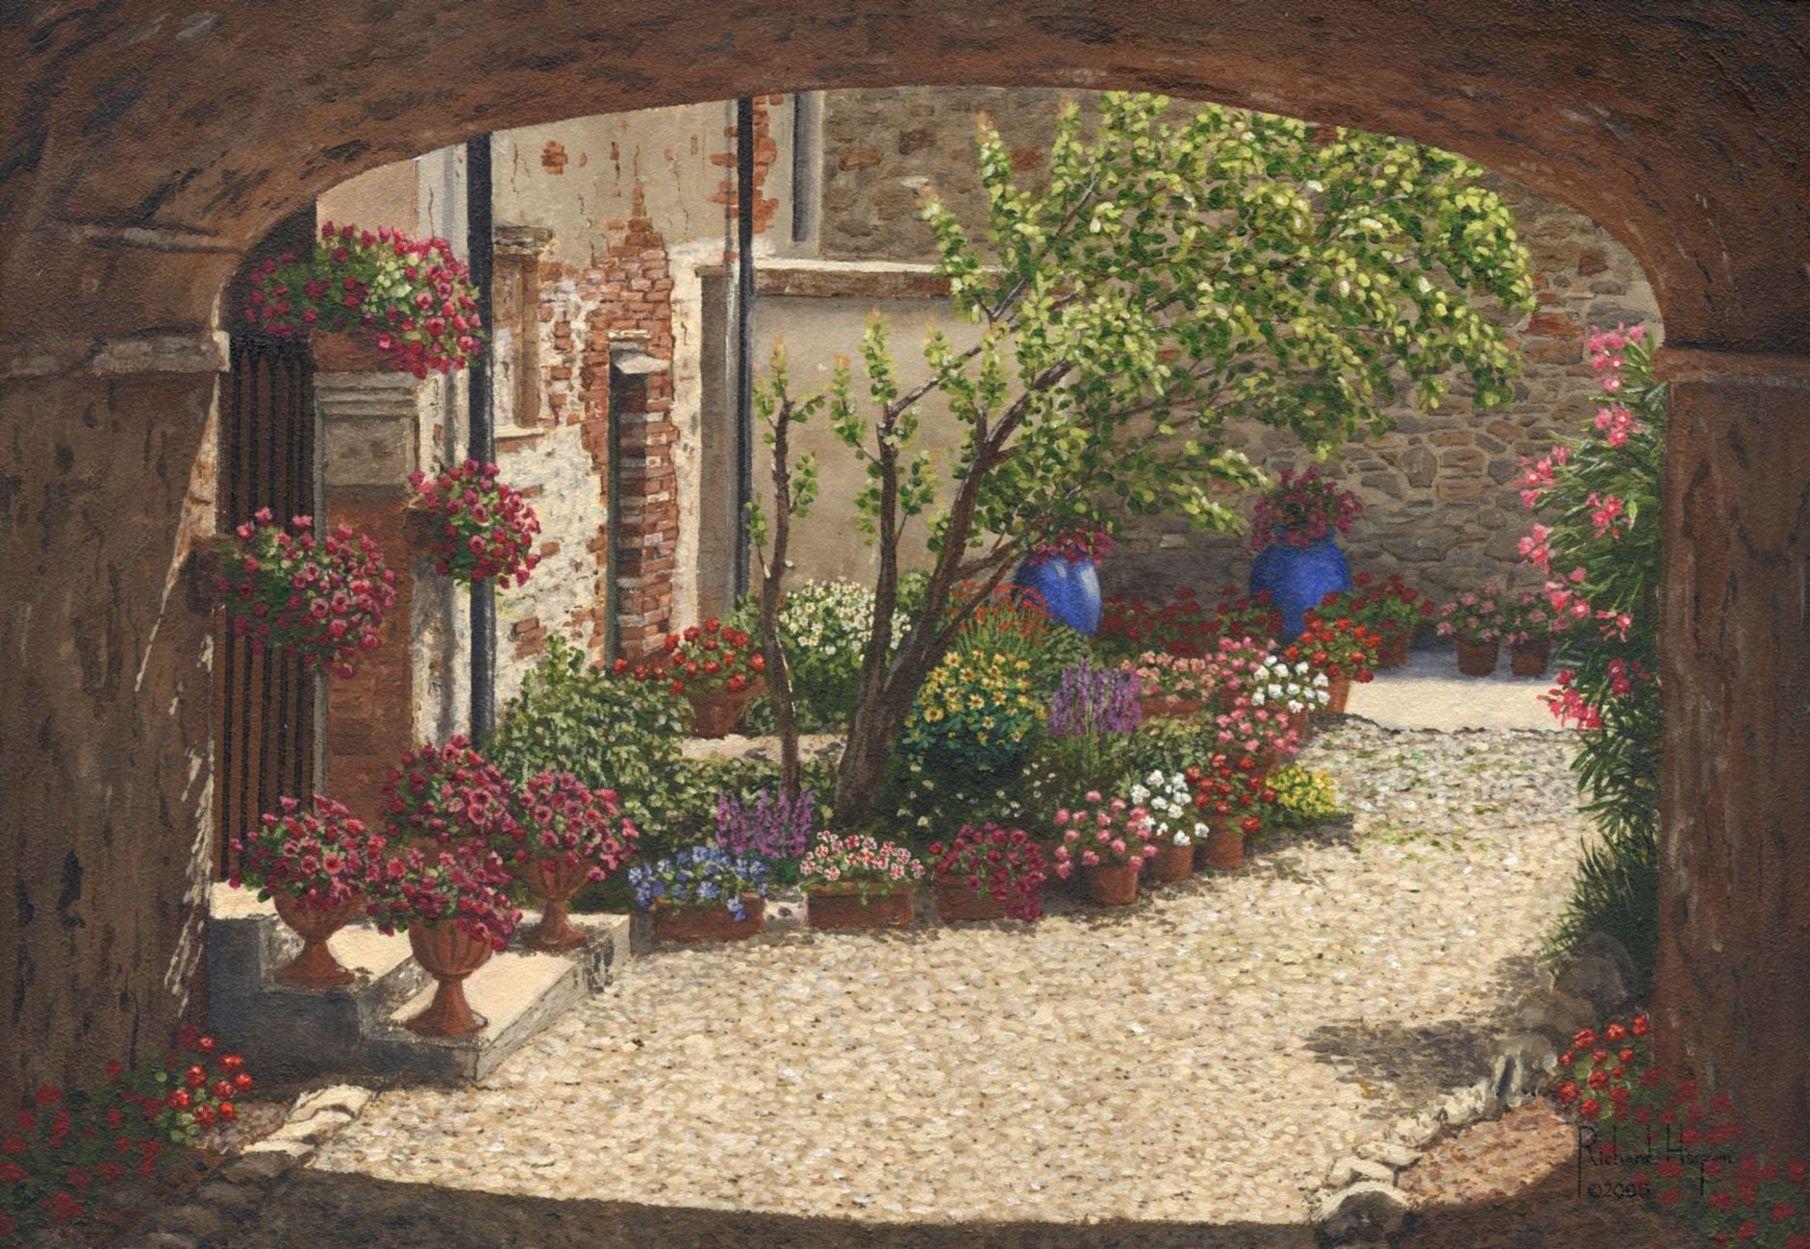 Hidden Garden - Villa di Camigliano, Tuscany